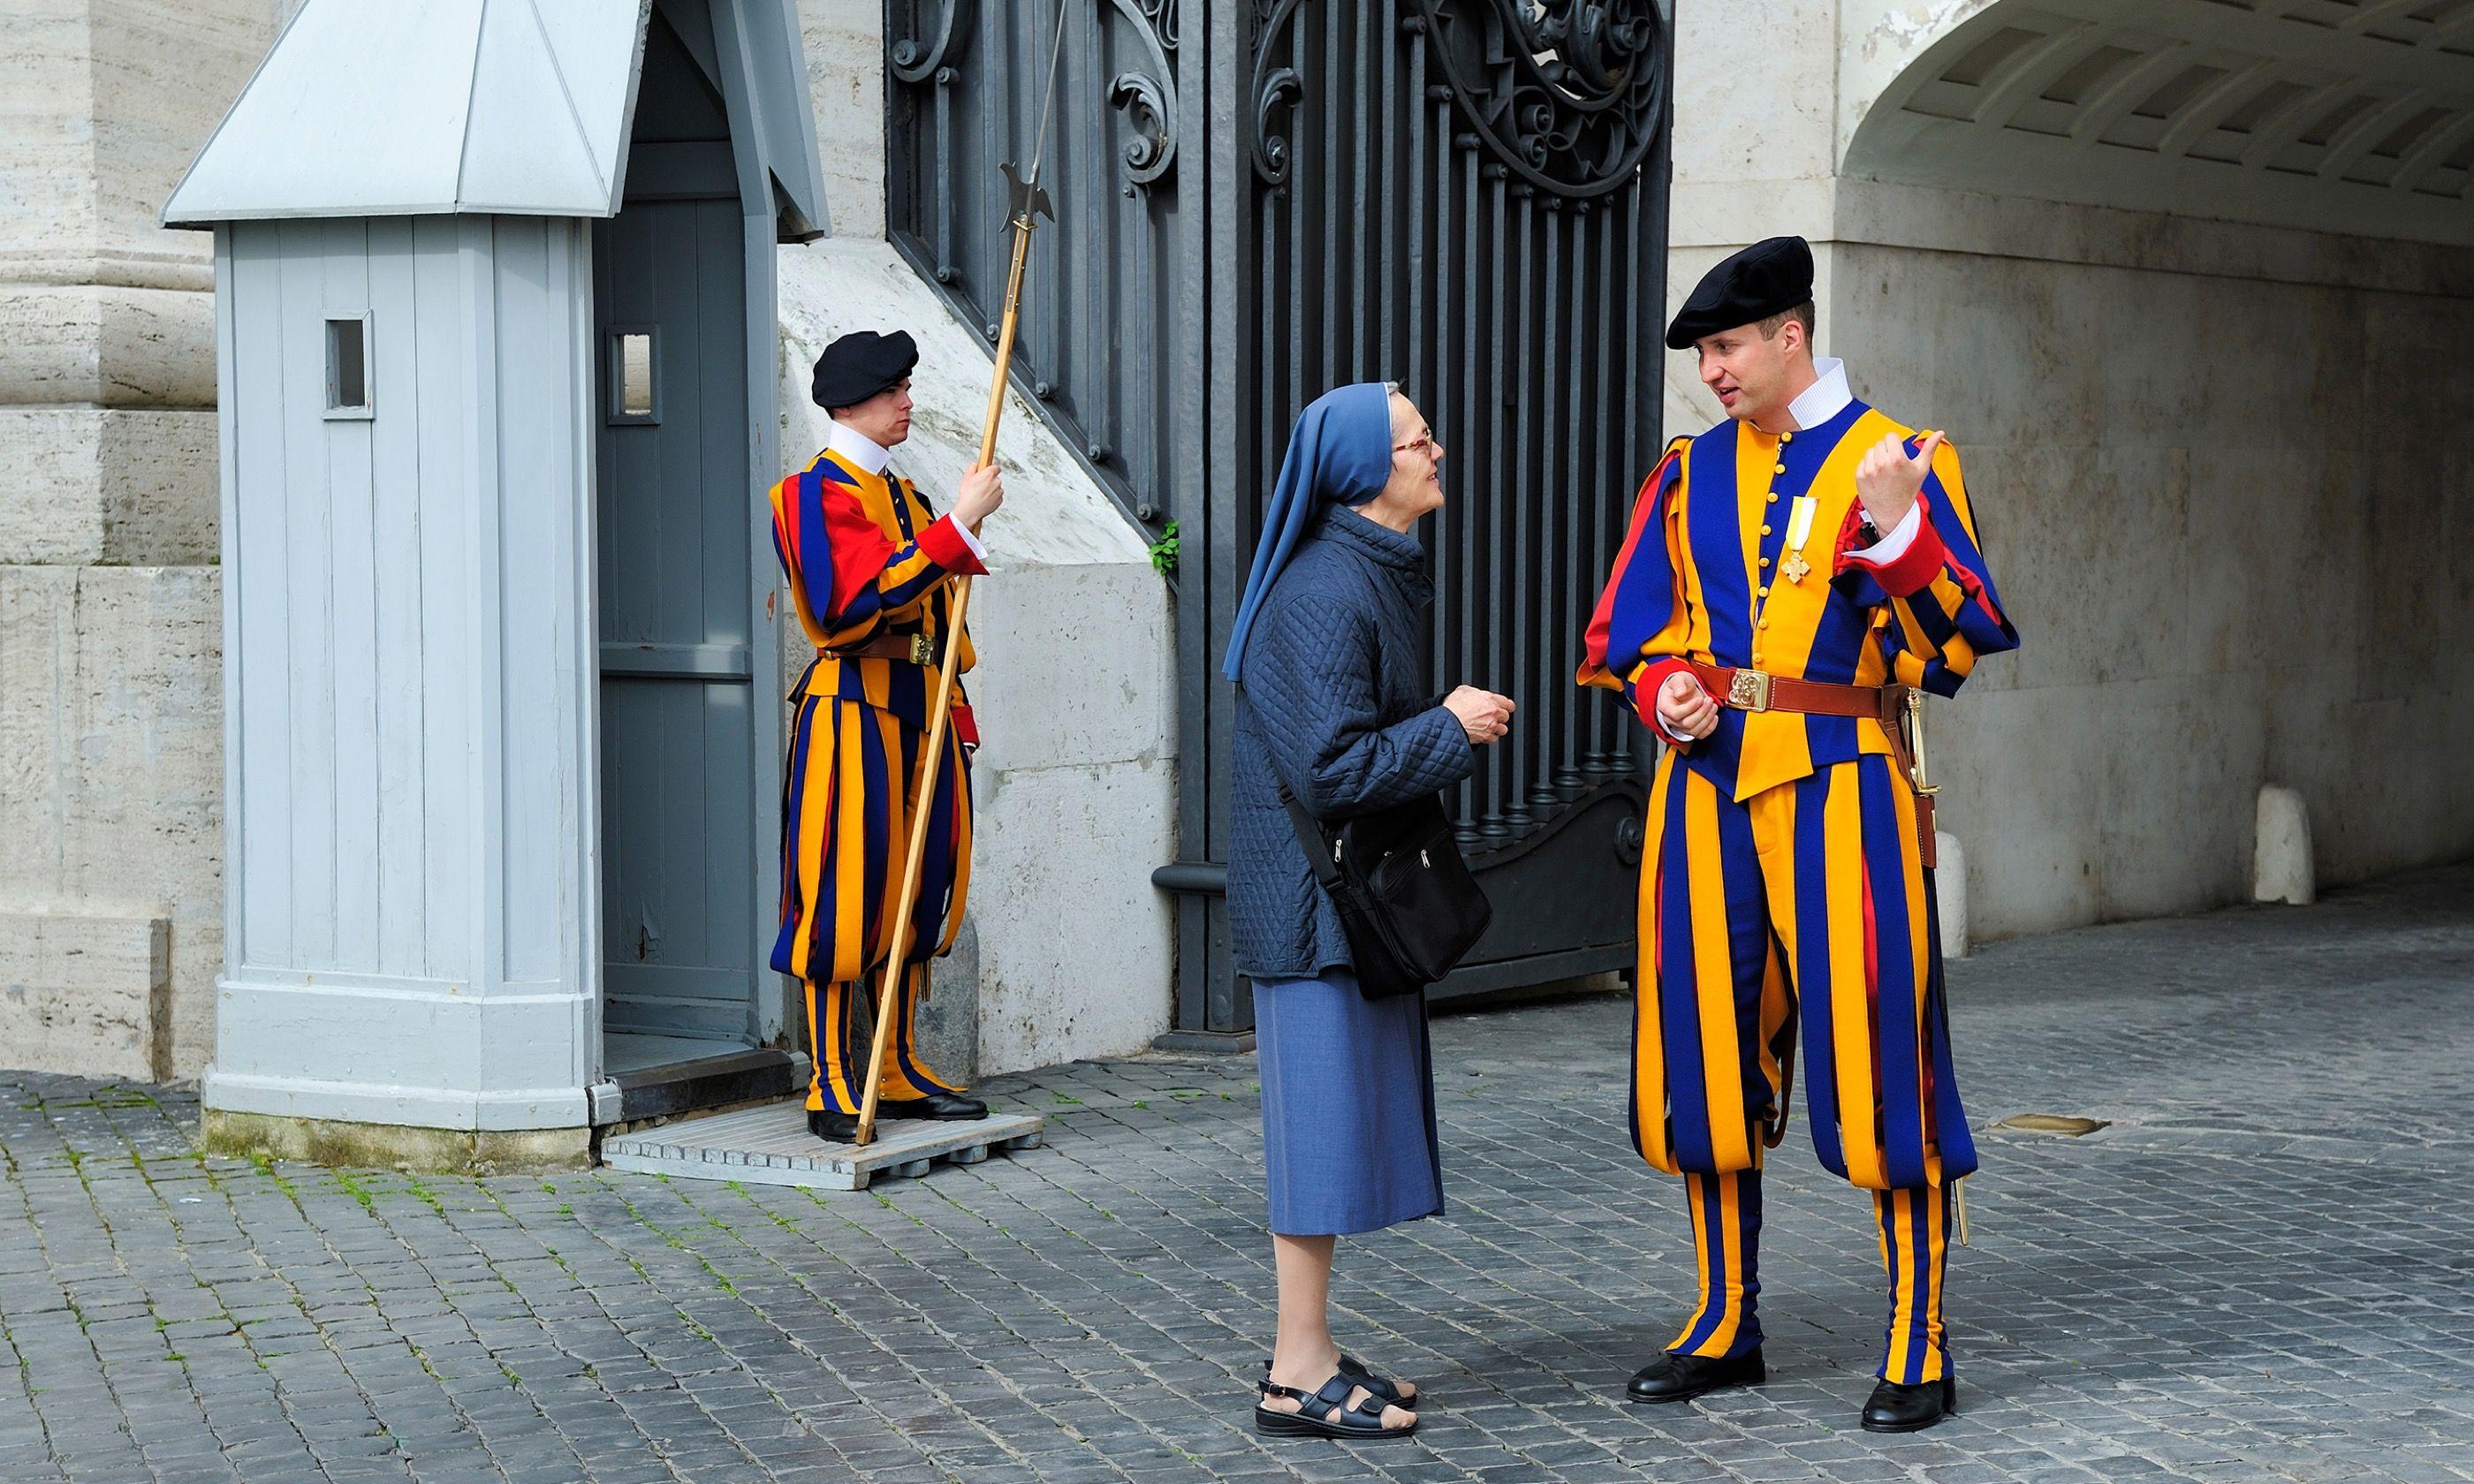 Swiss Guard chatting to nun (Shutterstock.com)